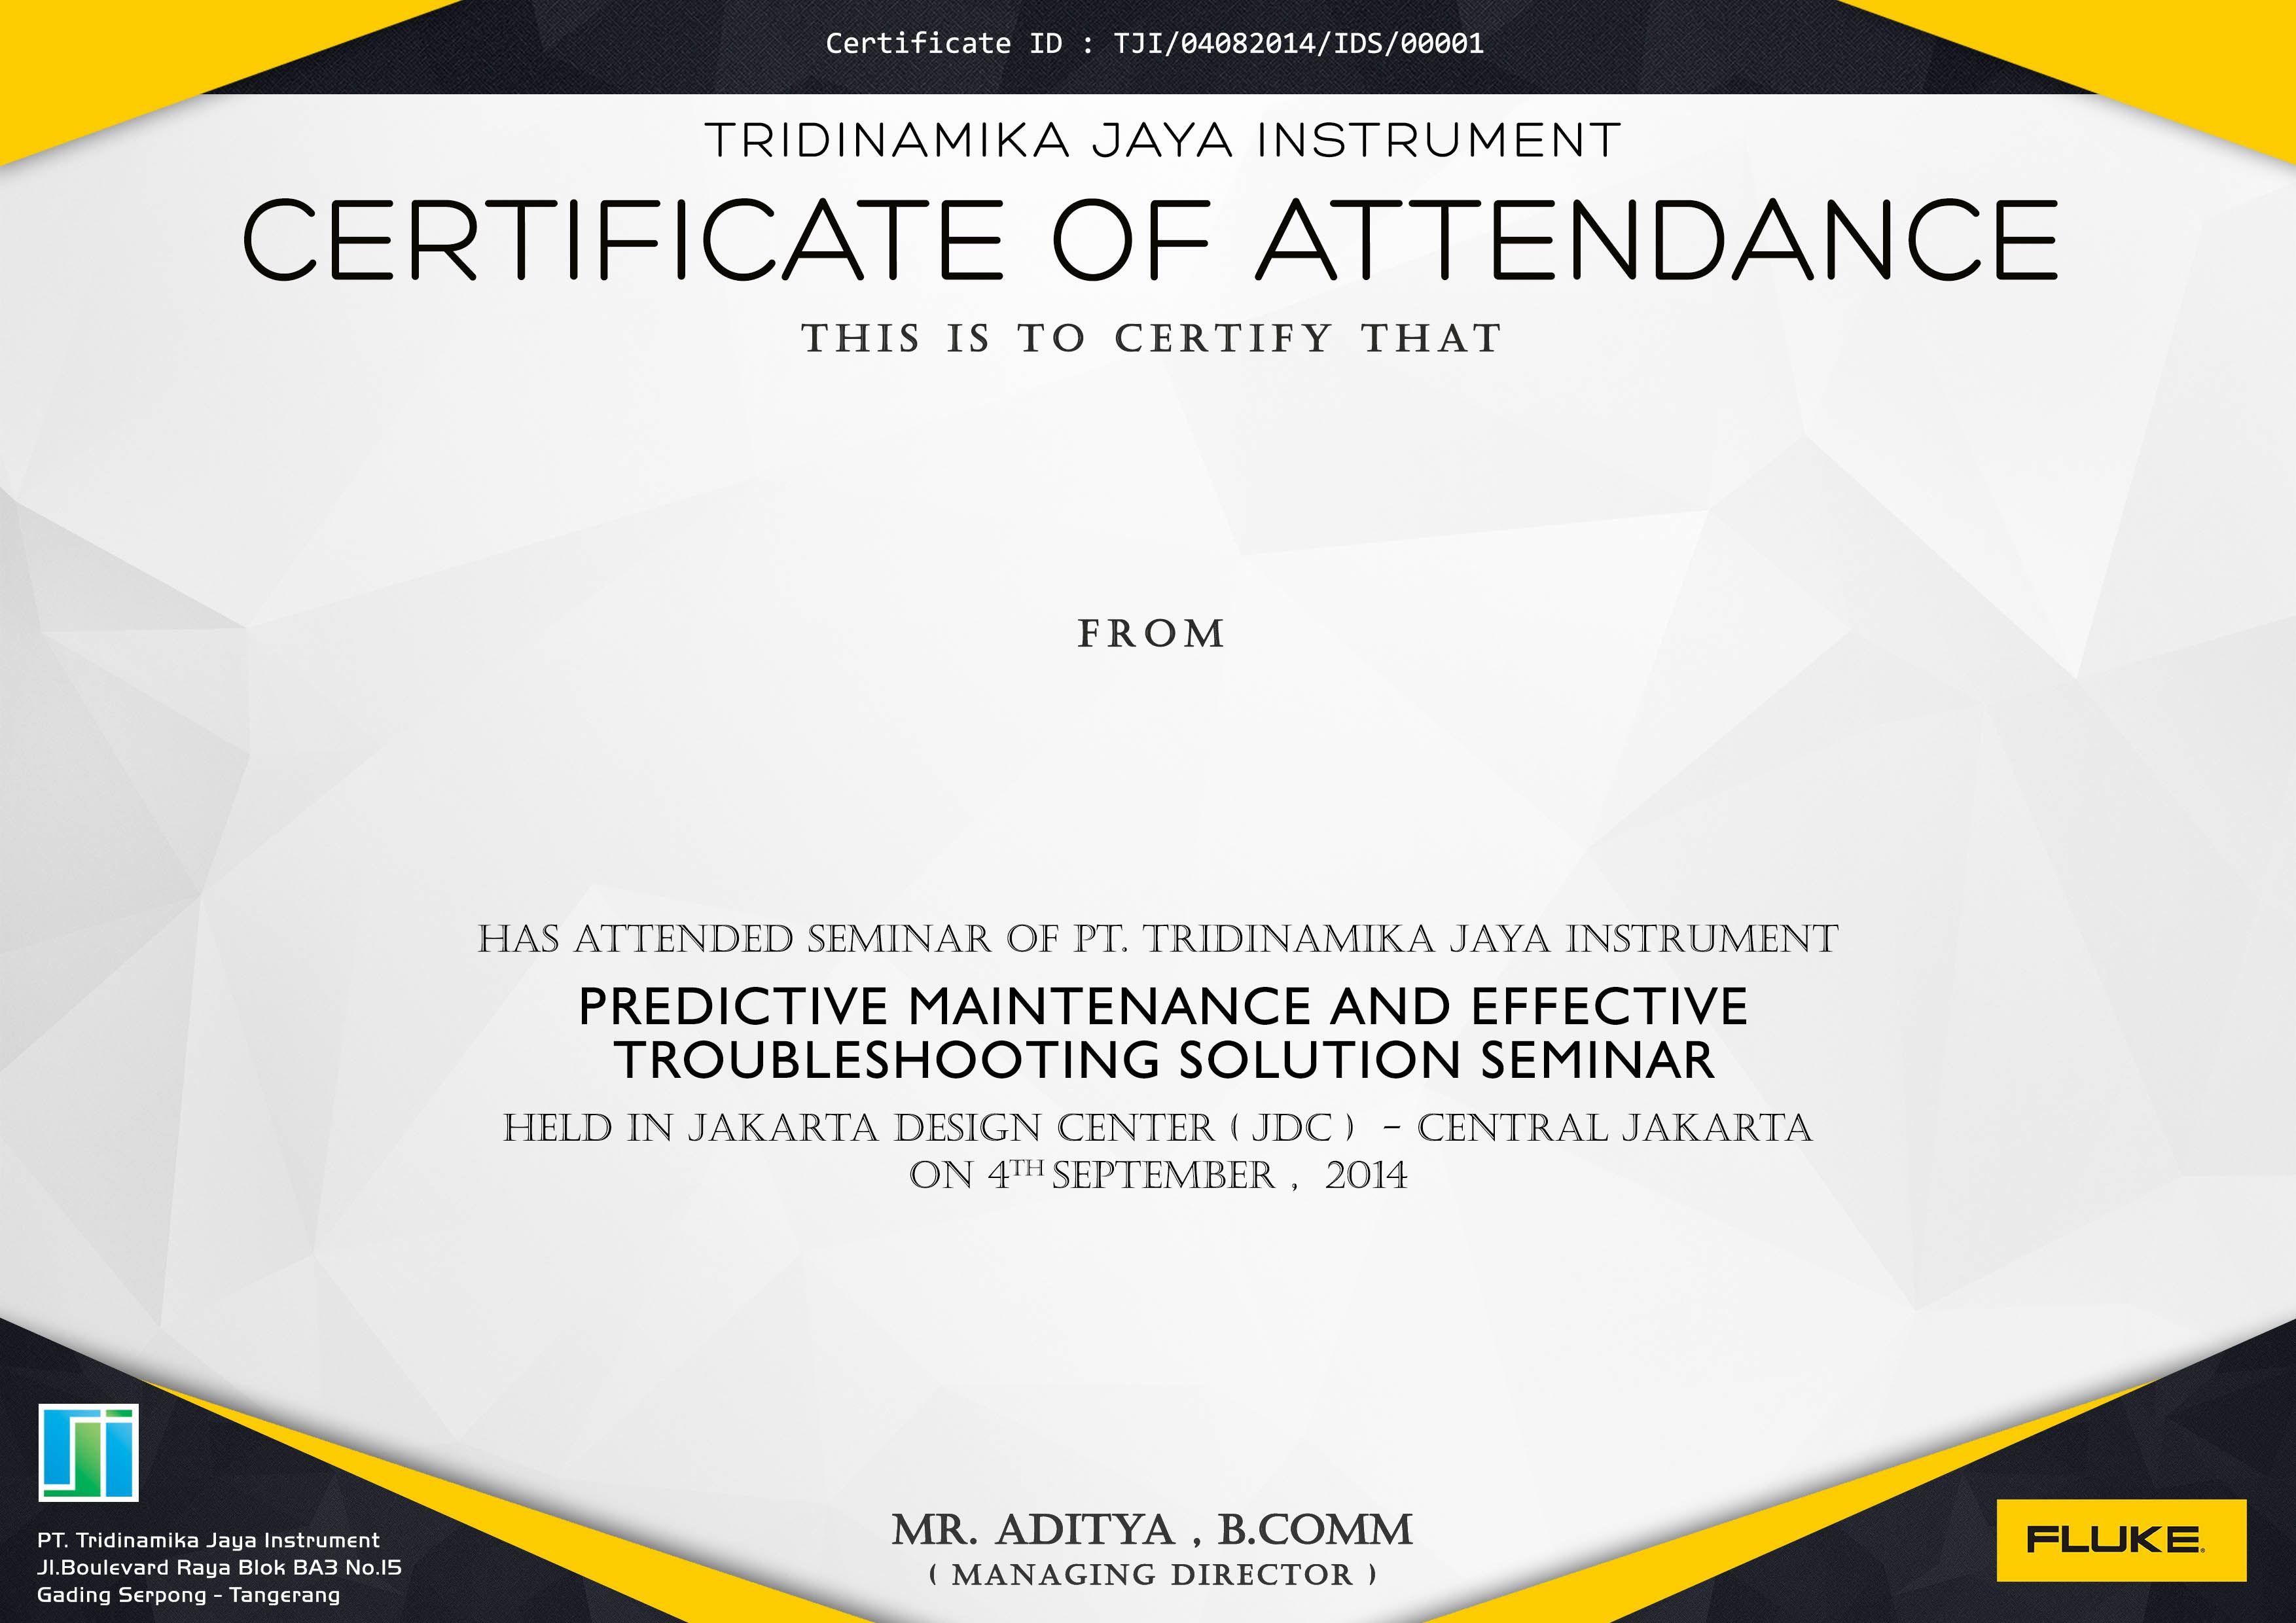 Fluke Seminar Certificate Design Inspiration